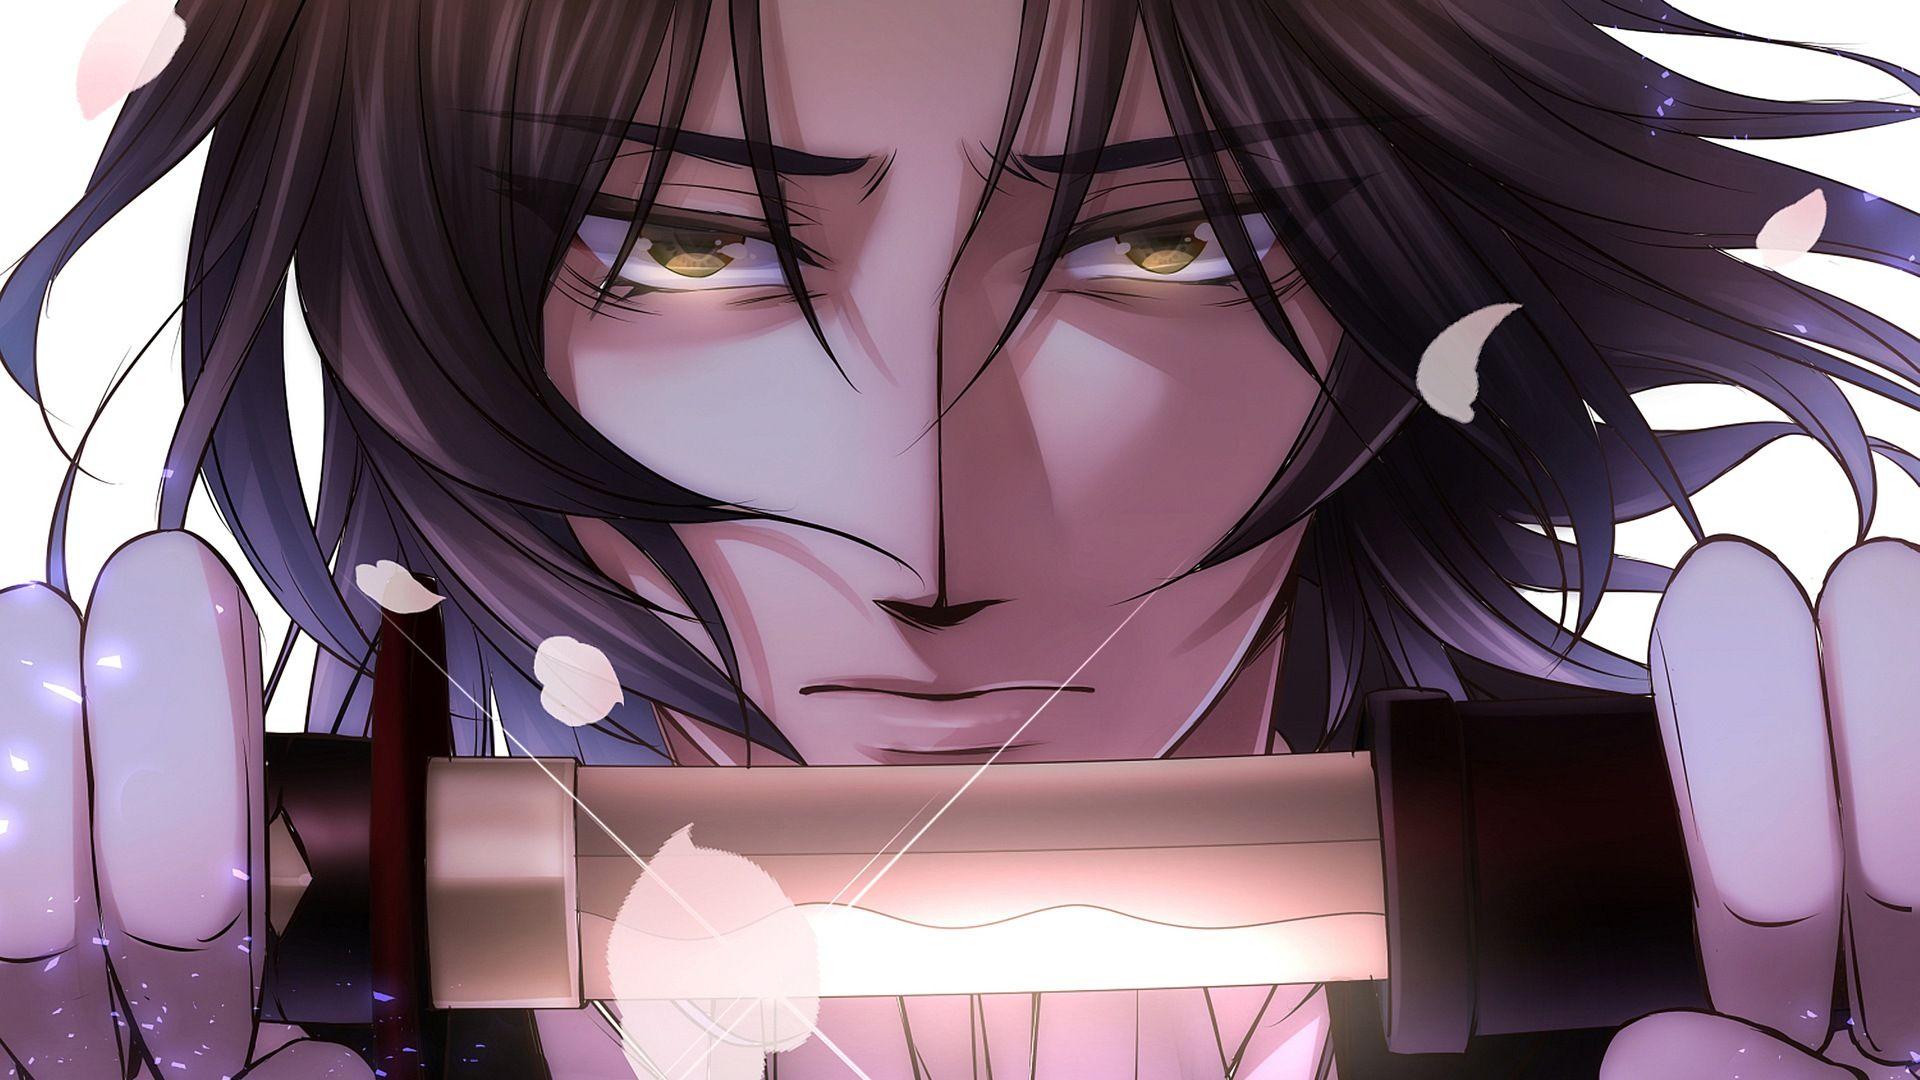 Hijikata Toshizo Drifters Anime Anime Drifter Anime Wallpaper